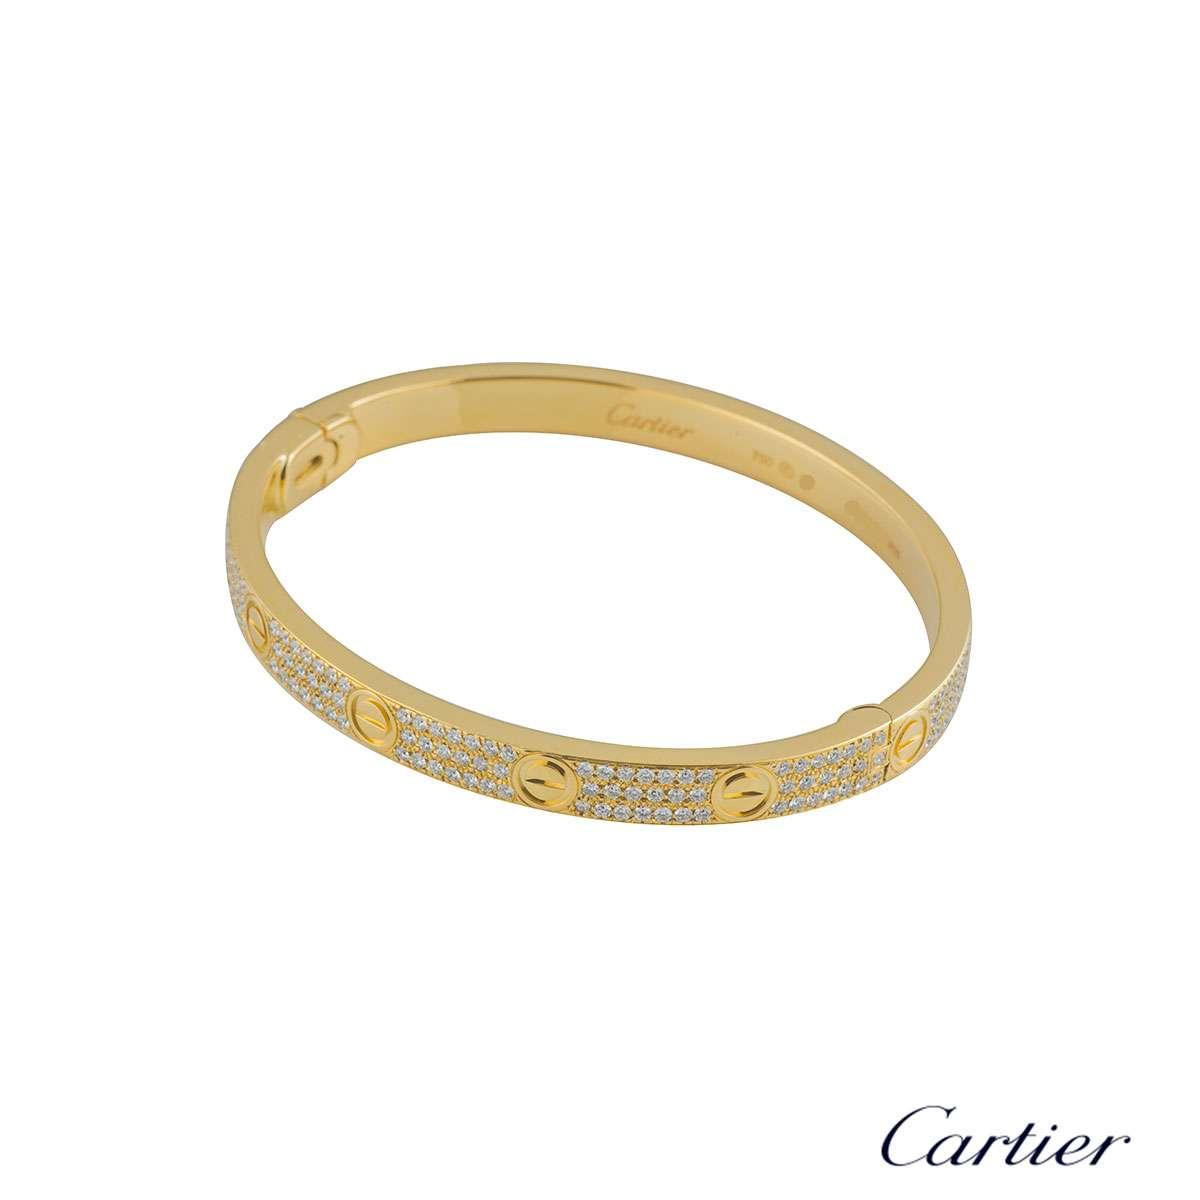 Cartier Yellow Gold Pave Diamond Love Bracelet Size 19 N6035019